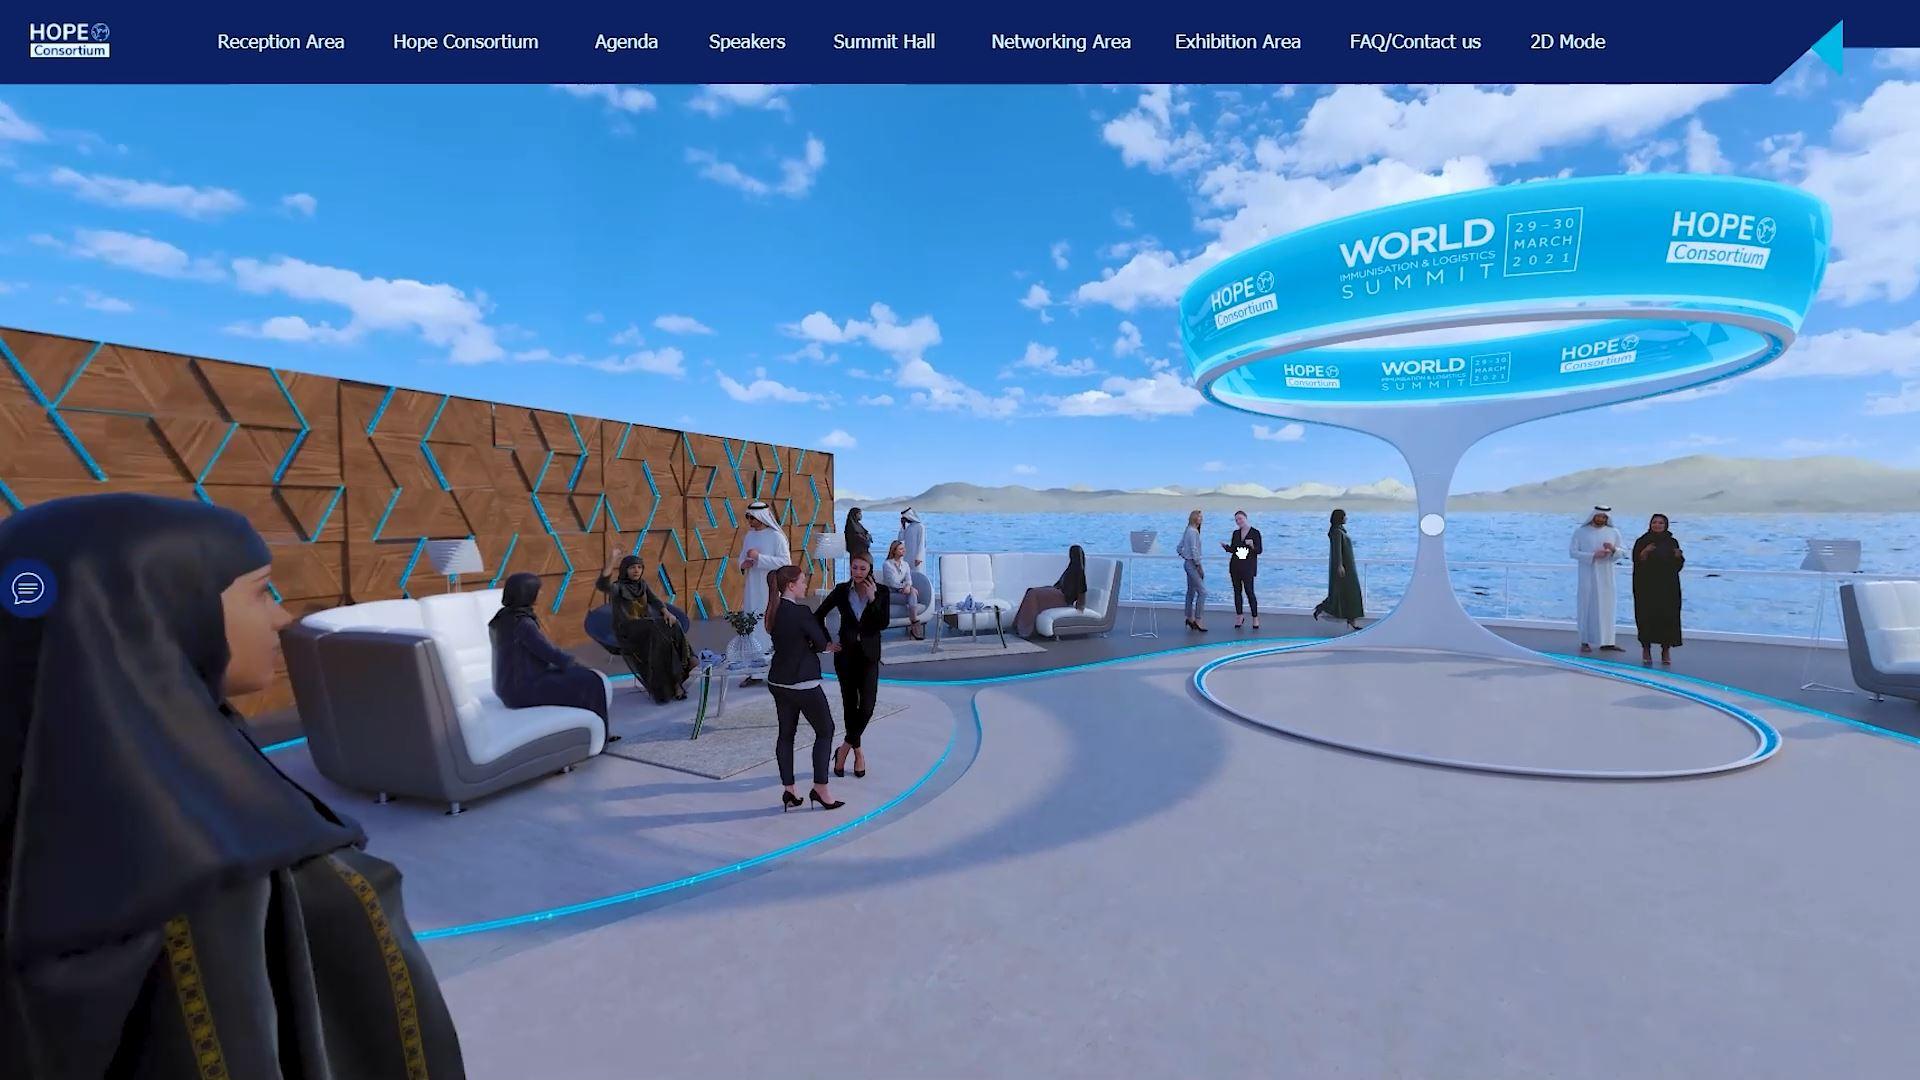 hope consortium world immunization and logistics summit virtual exhibition reception area